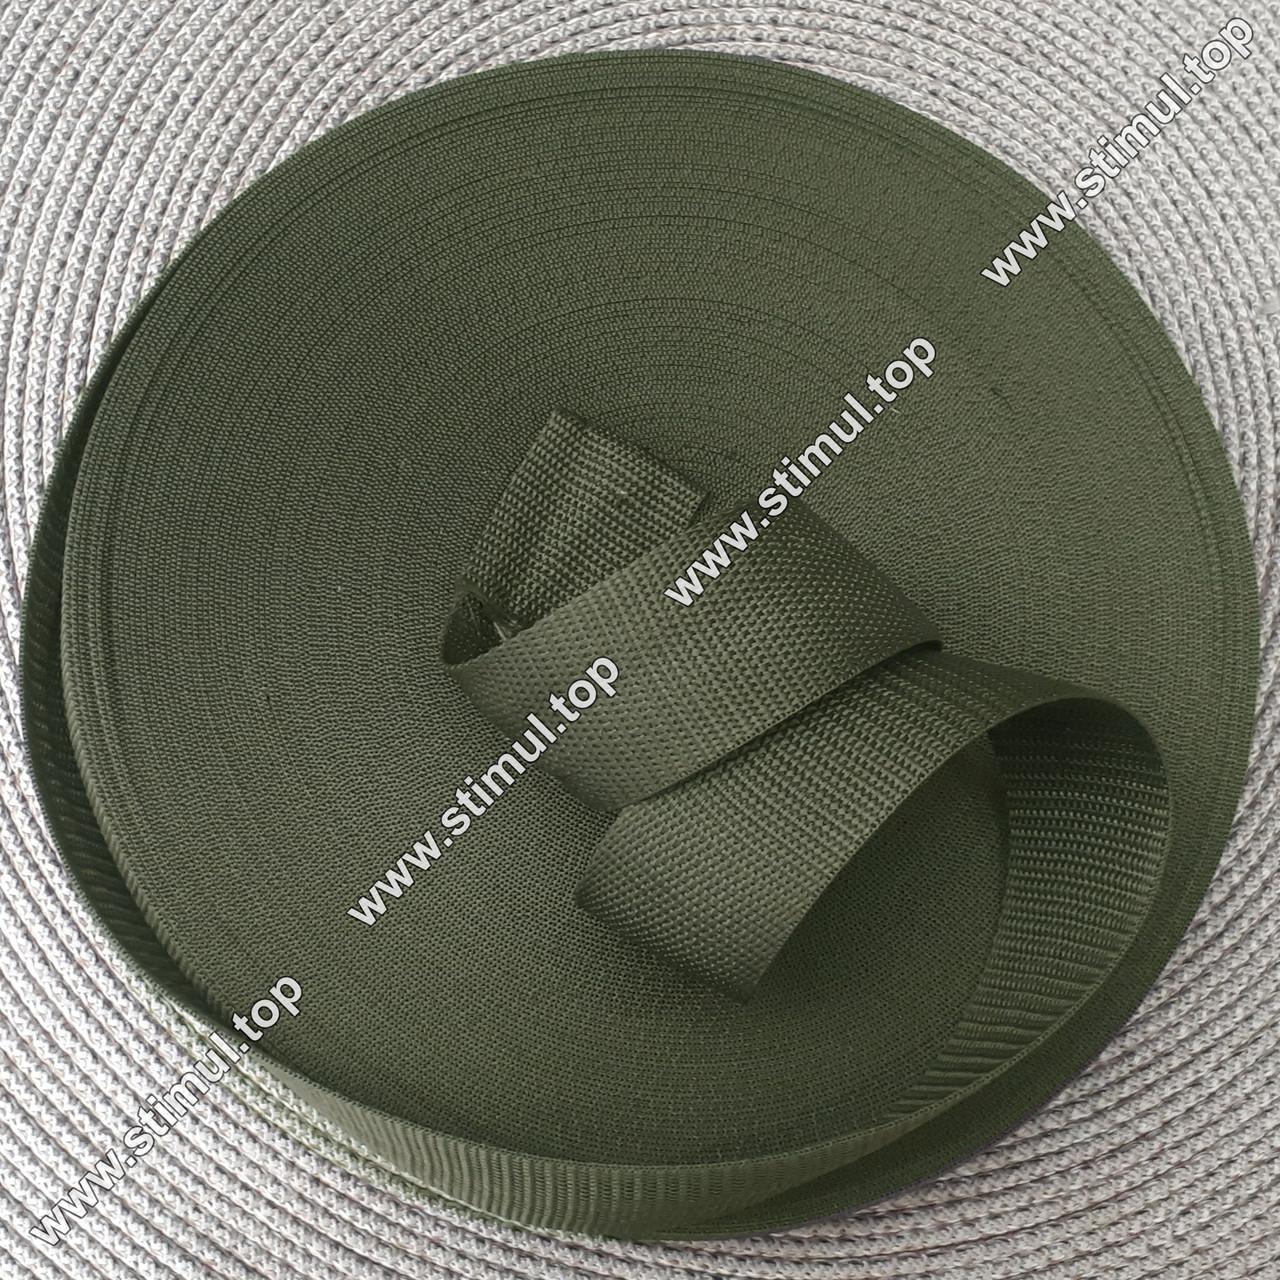 Тесьма цветная 30 мм (бухта 50 м) ХАКИ / Стропа сумочная ременная / Лента для рюкзаков / Стрічка ремінна